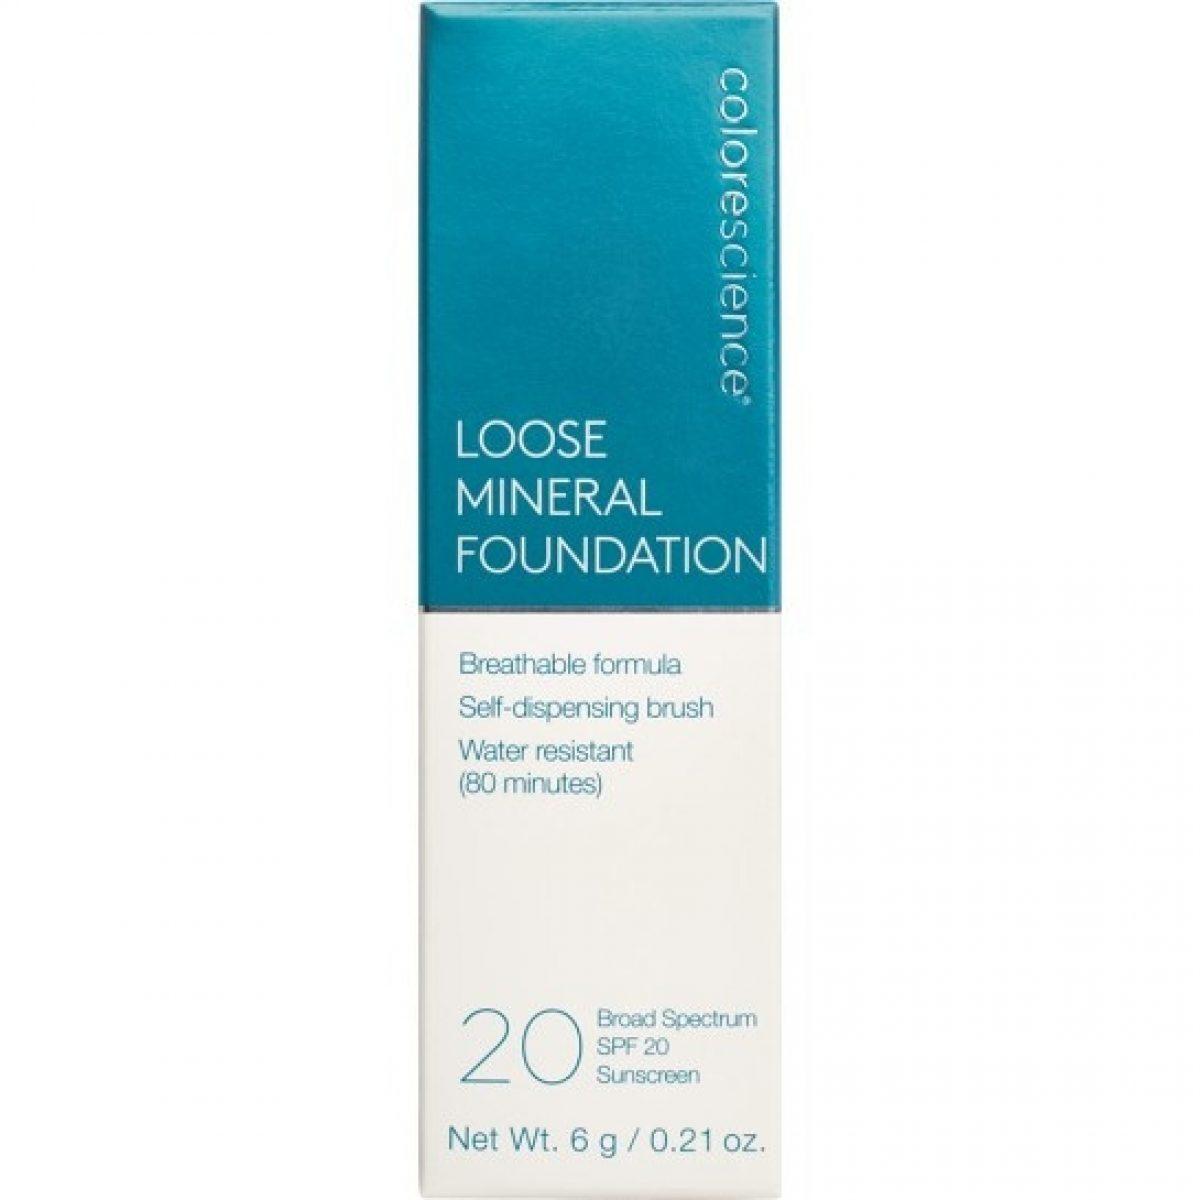 Loose Mineral Foundation Brush SPF 20